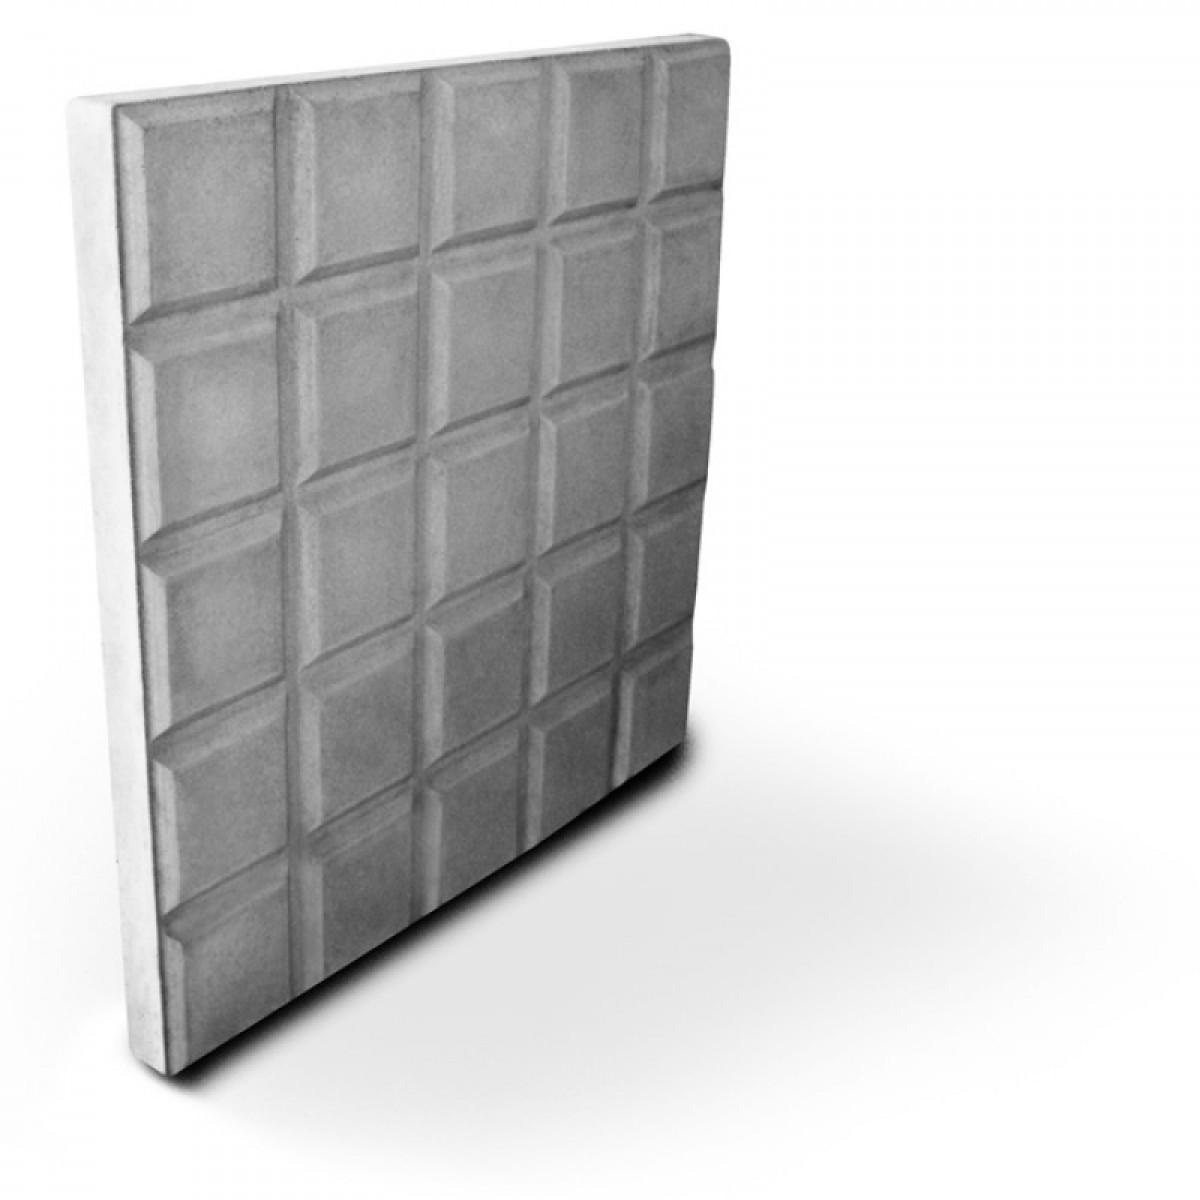 Foto 1 - Forma Plástica Para Ladrilho Xadrez 25 Quadros FP044 20X20X1,5 Rendimento 25PÇAS P/M²